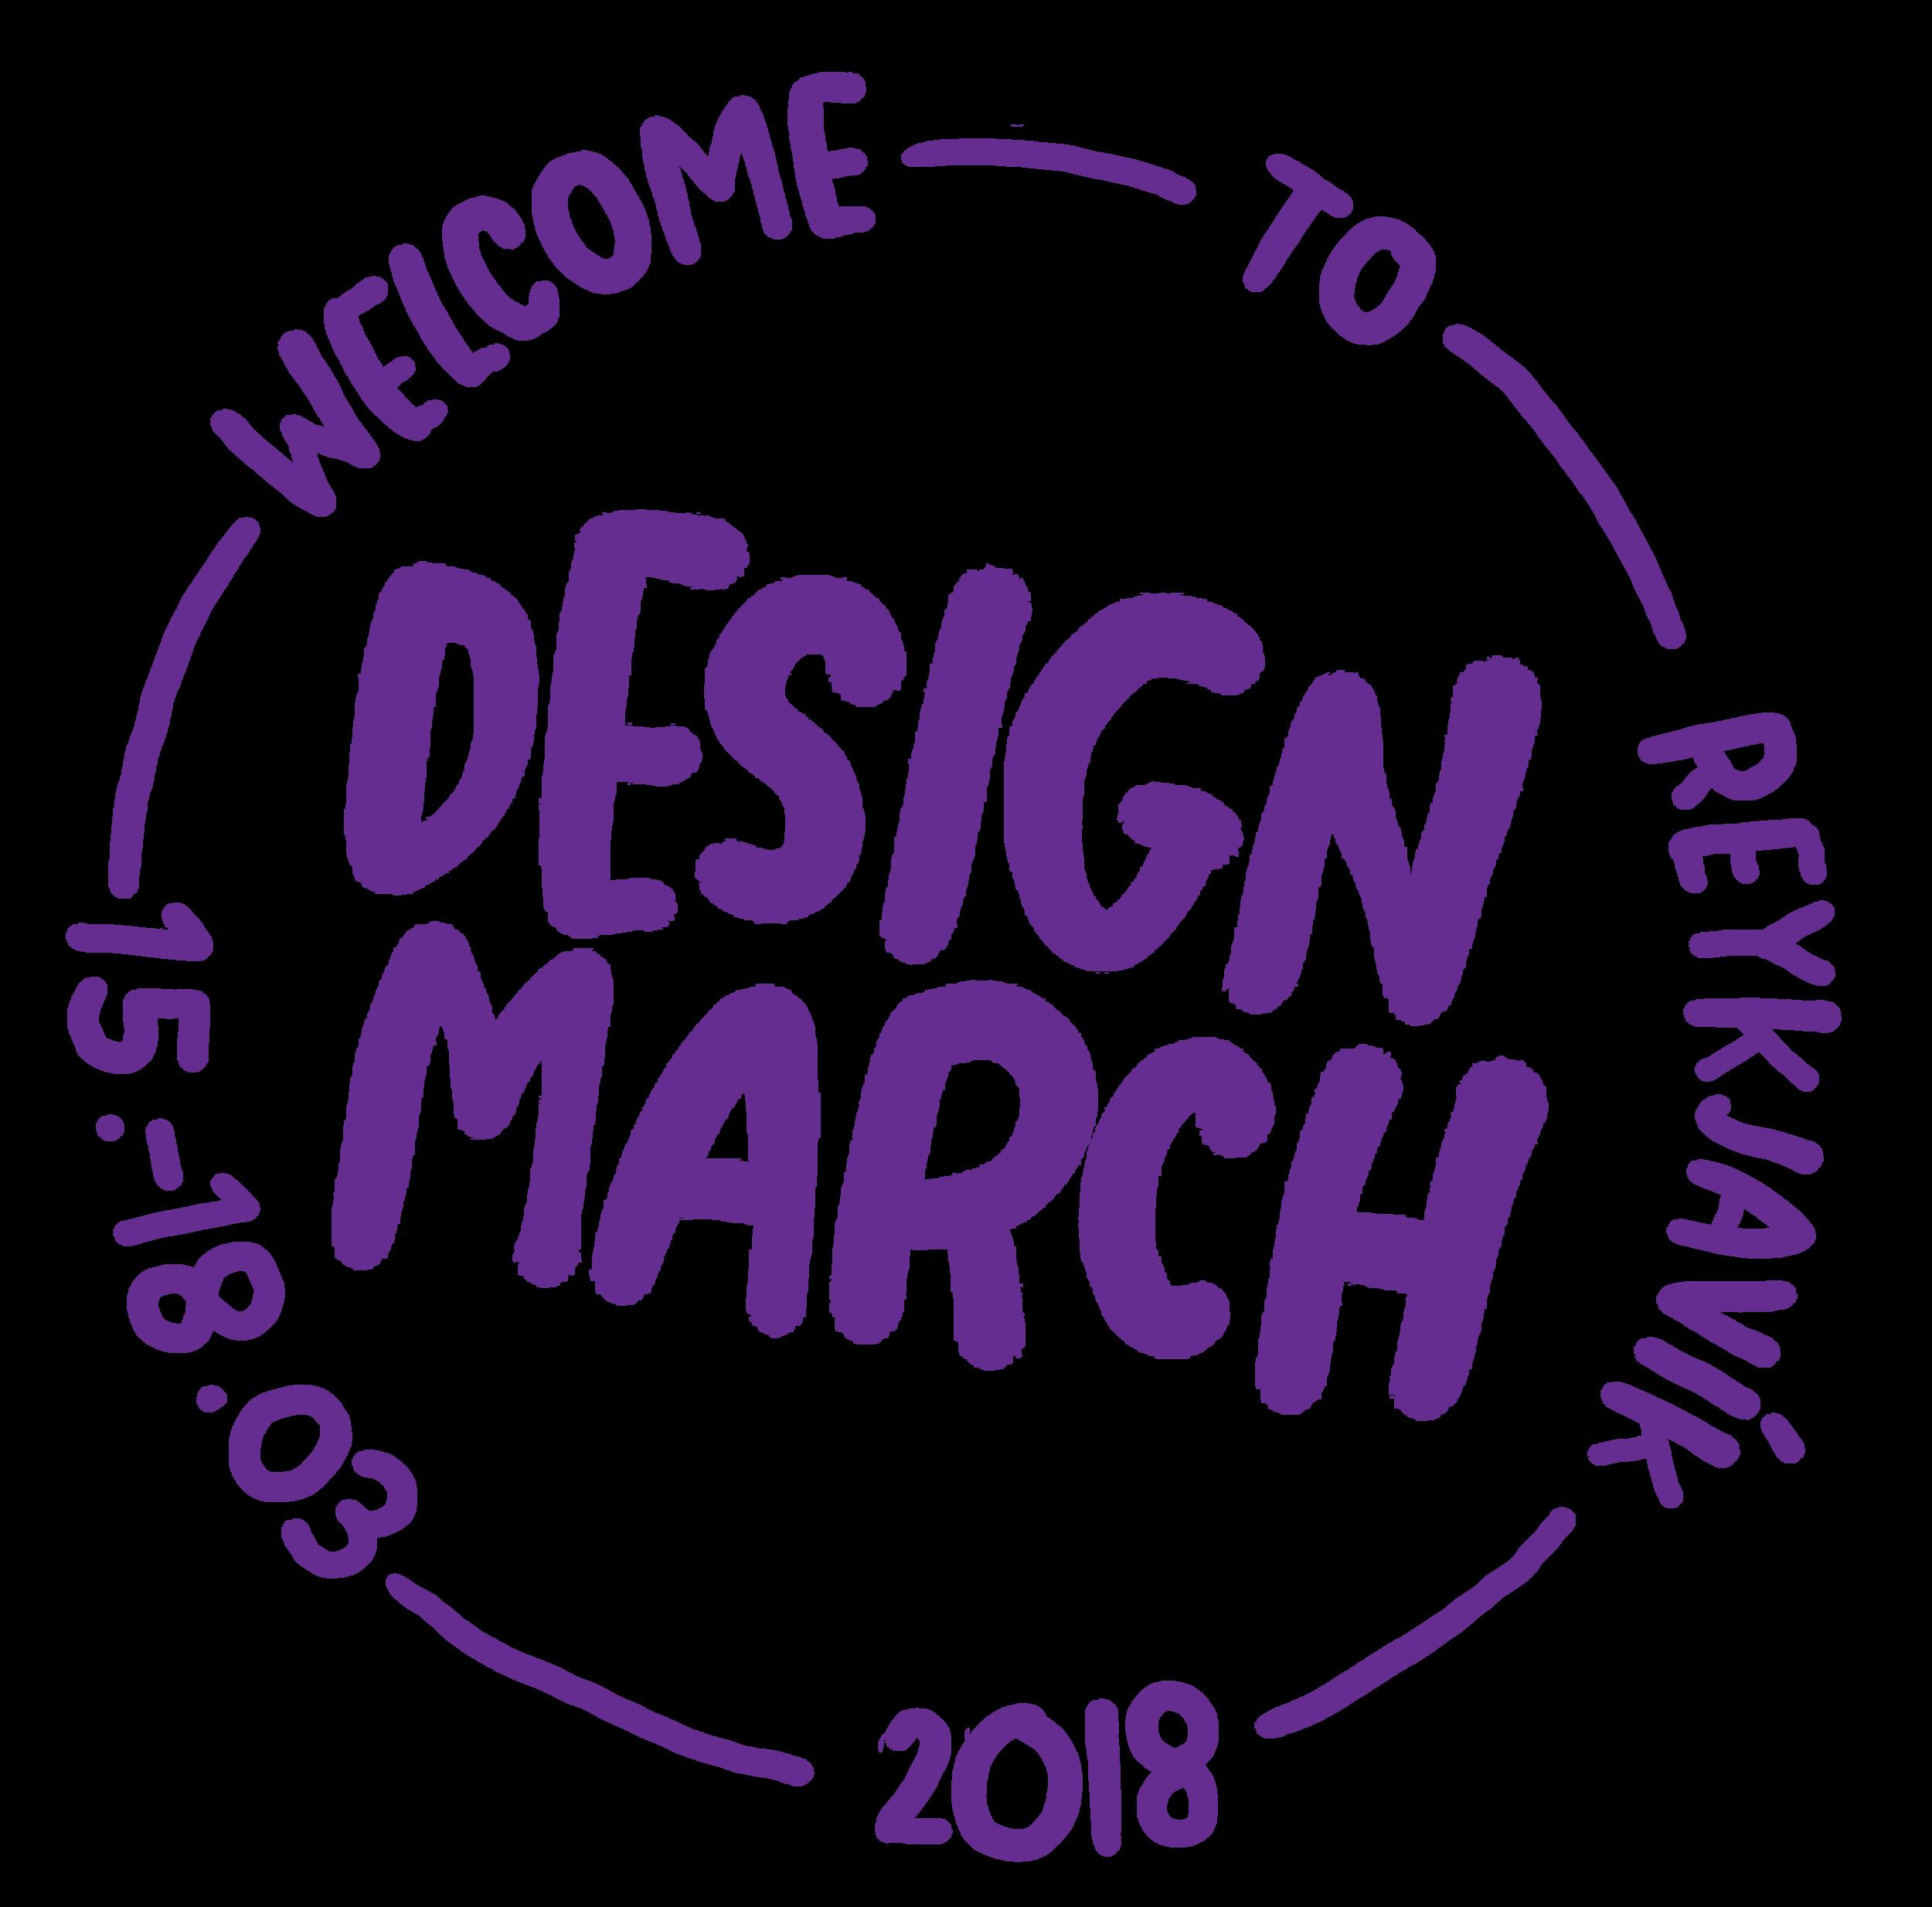 Design+a+March+brand+identity+|+tomasdottir.+|+logo+design,+pattern+design,+online+marketing,+festival+design,+branding,+illustration,+modern,+icon+design